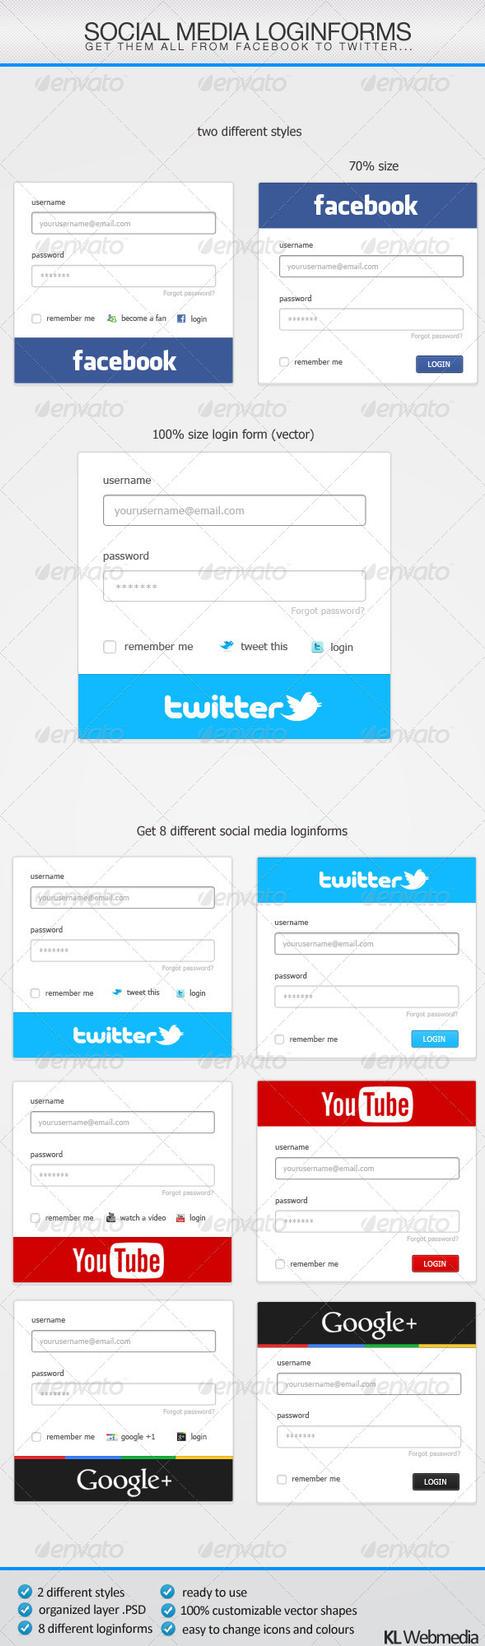 Social Media Loginforms by KL-Webmedia